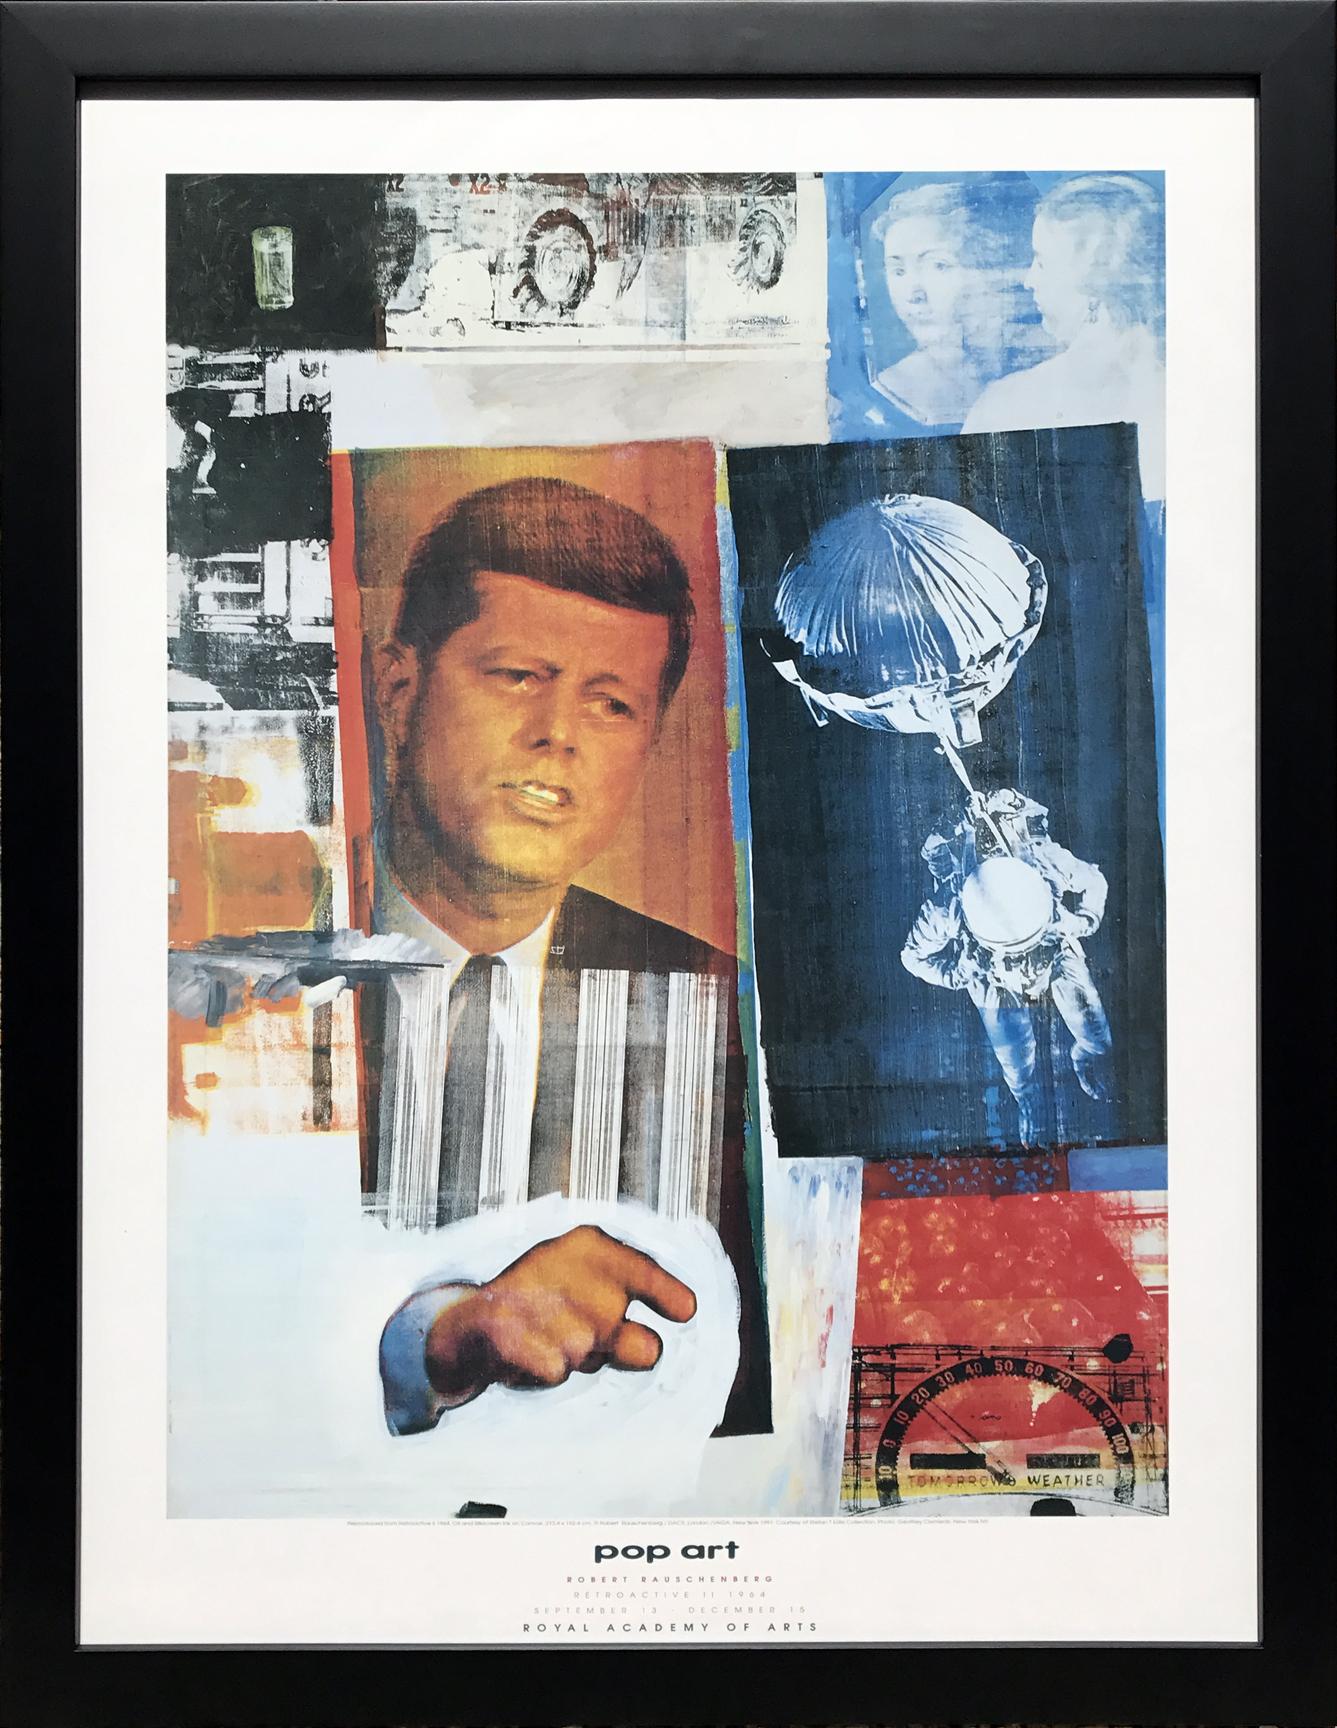 Pop Art, Royal Academy of Arts poster